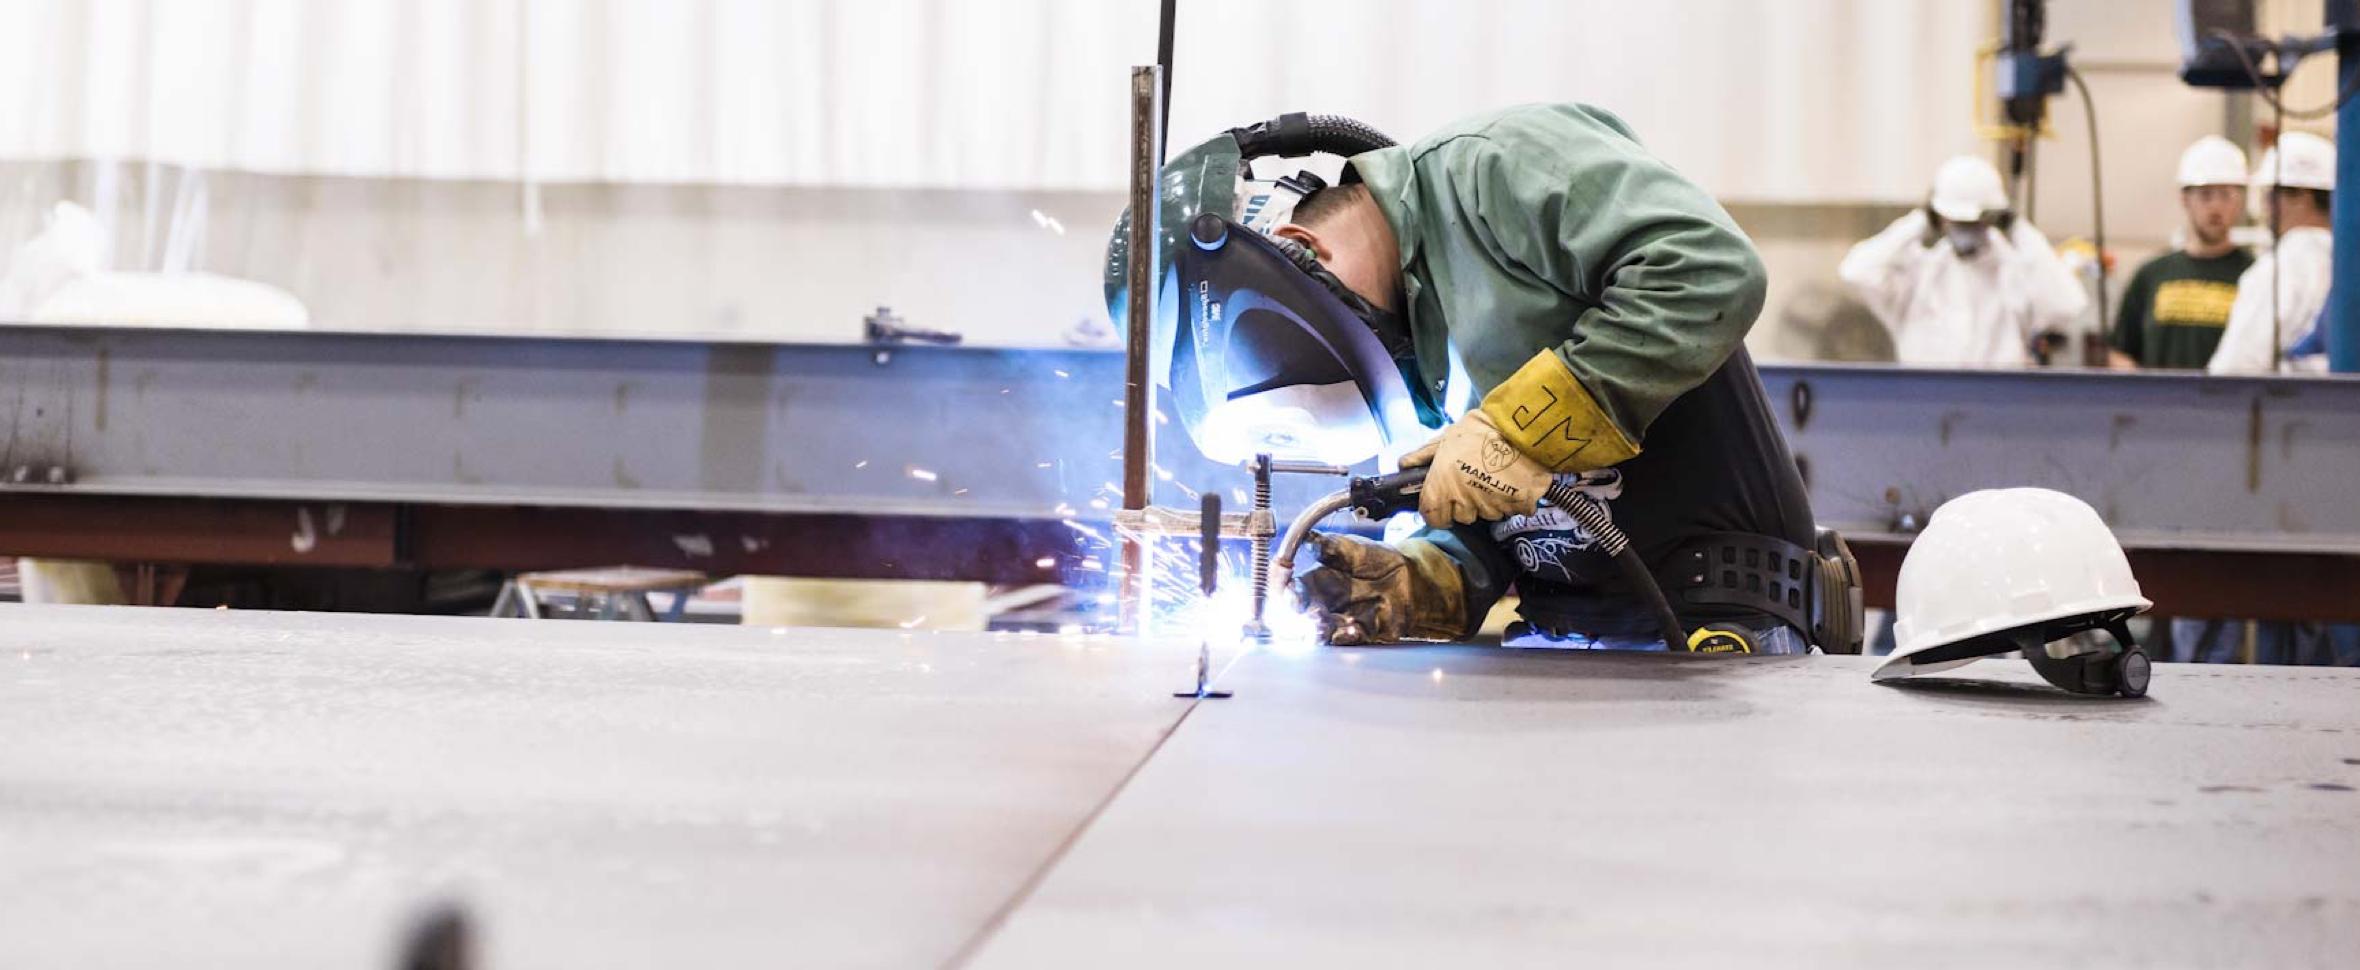 Safety - Welder in protective gear welding steel